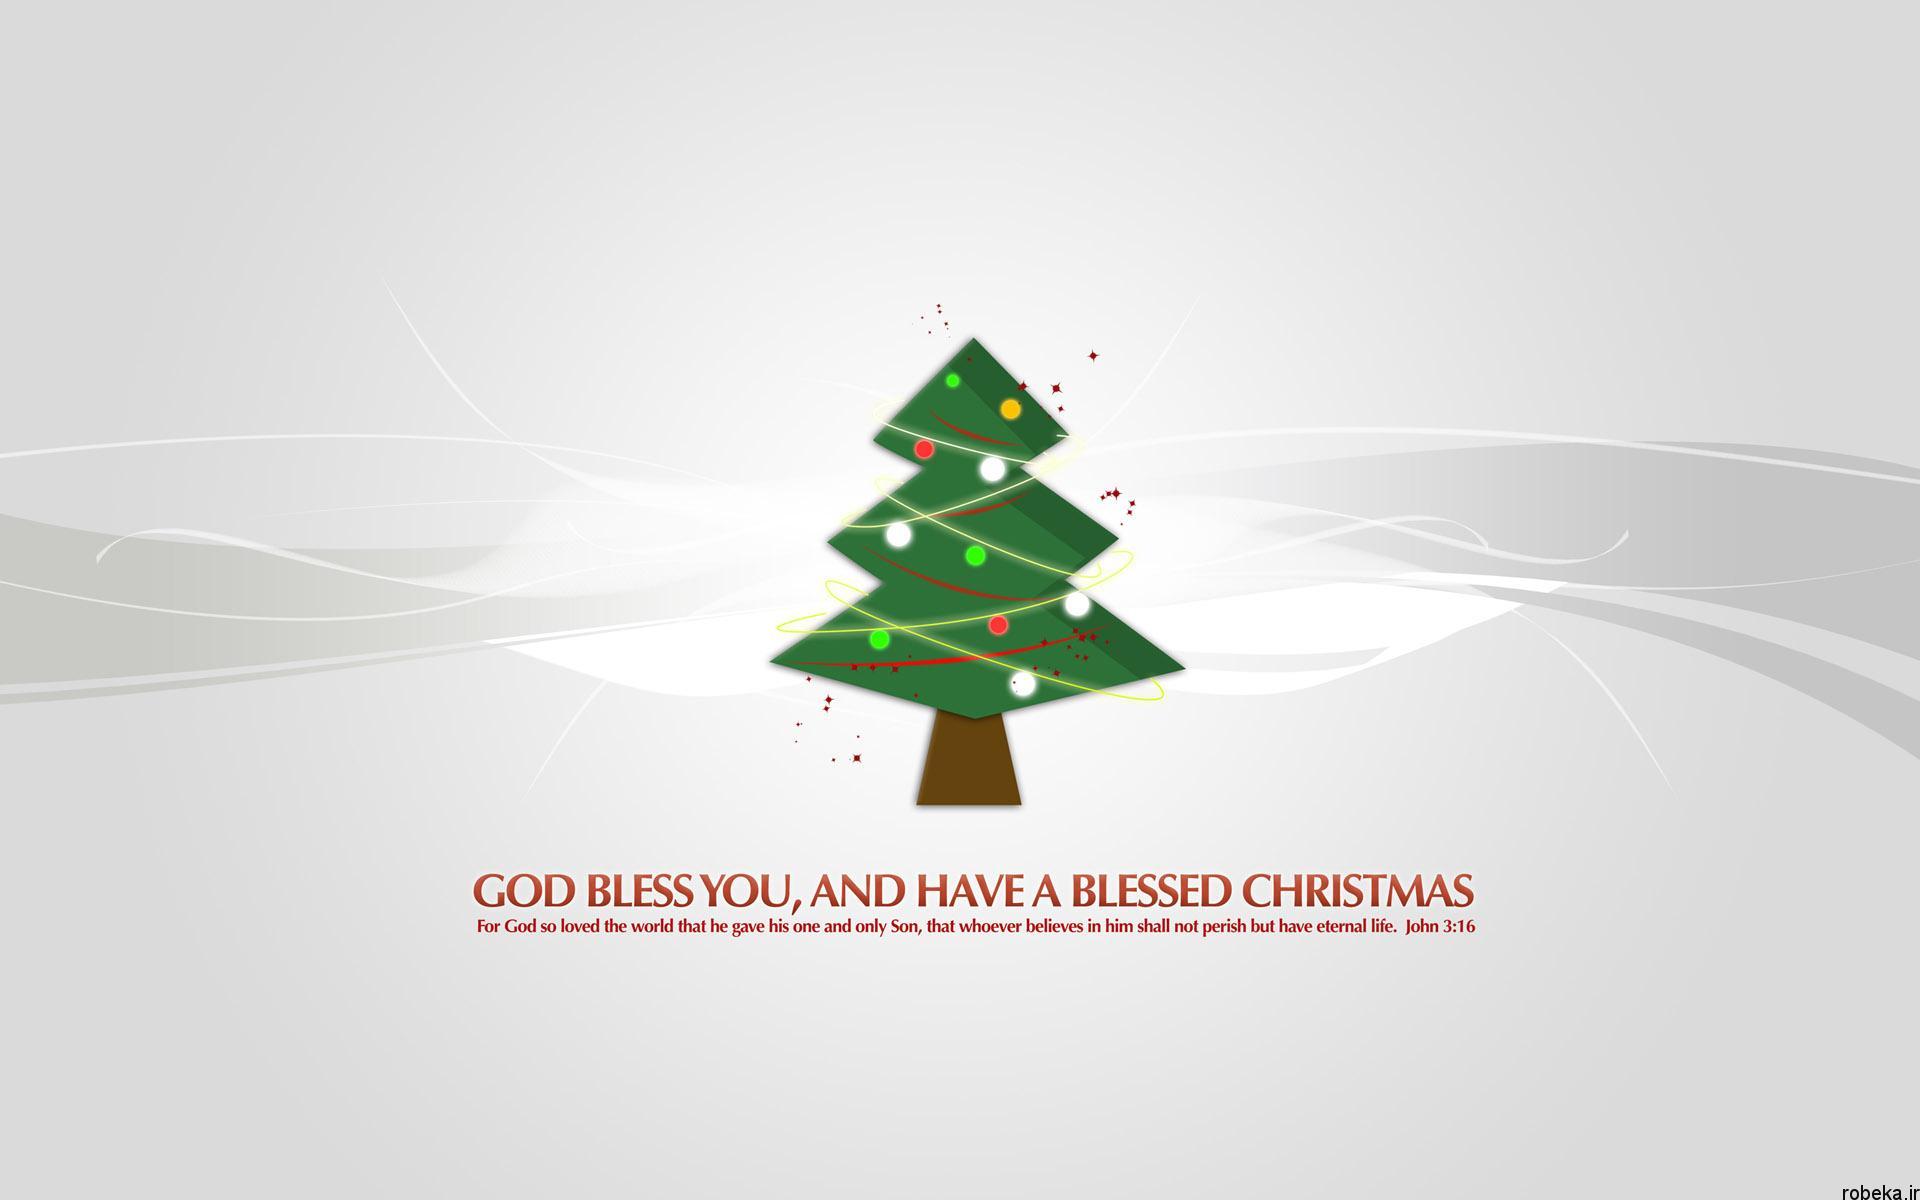 Download Christmas Wallpapers HD Quality 8 دانلود والپيپر كريسمس با كيفيت بالا